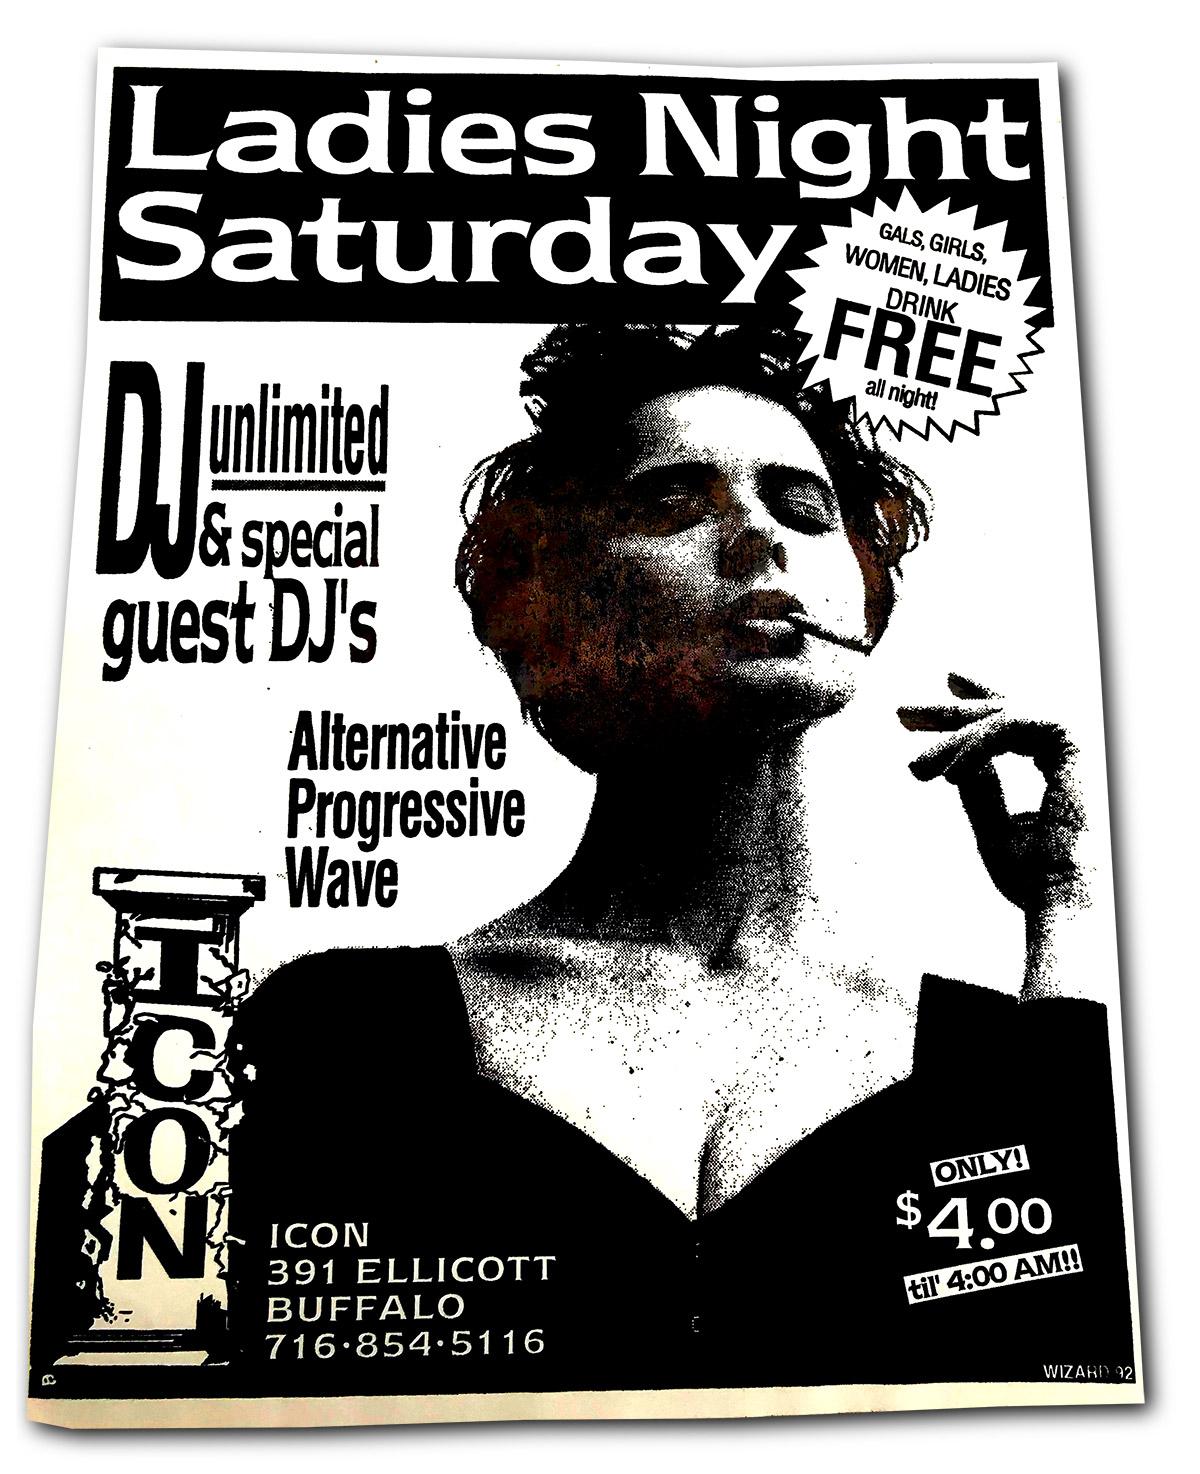 ICON, ladies night, buffalo ny, club poster design